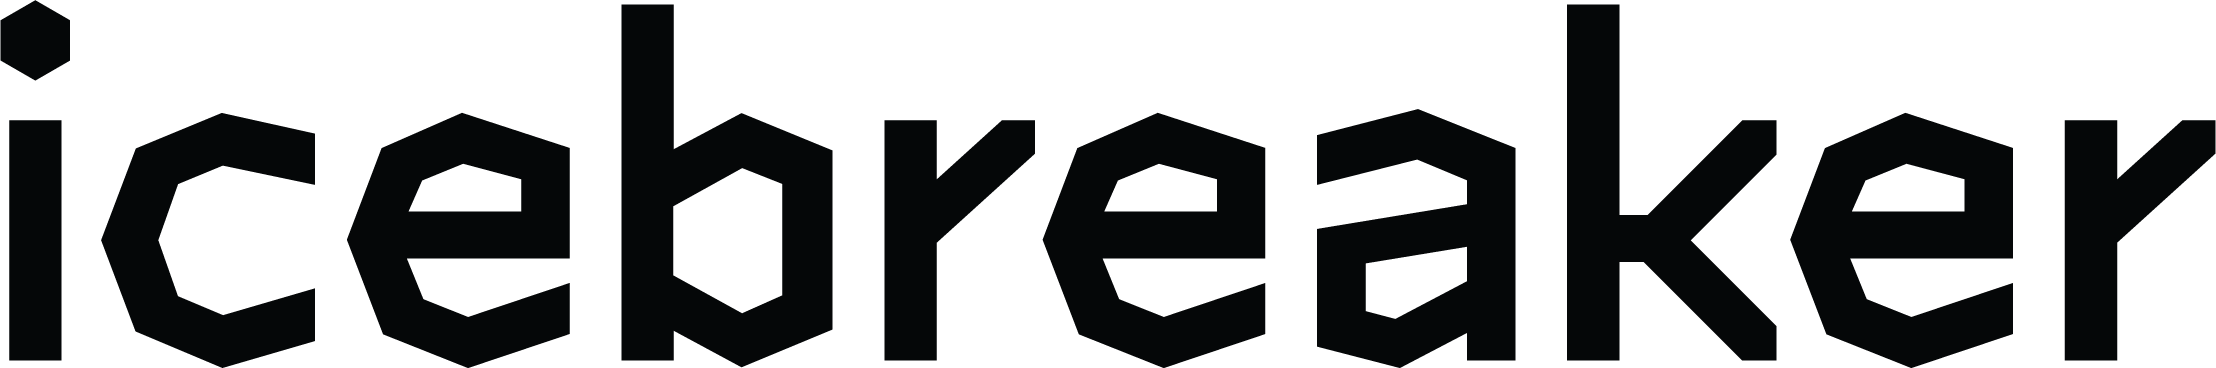 Icebreaker VC